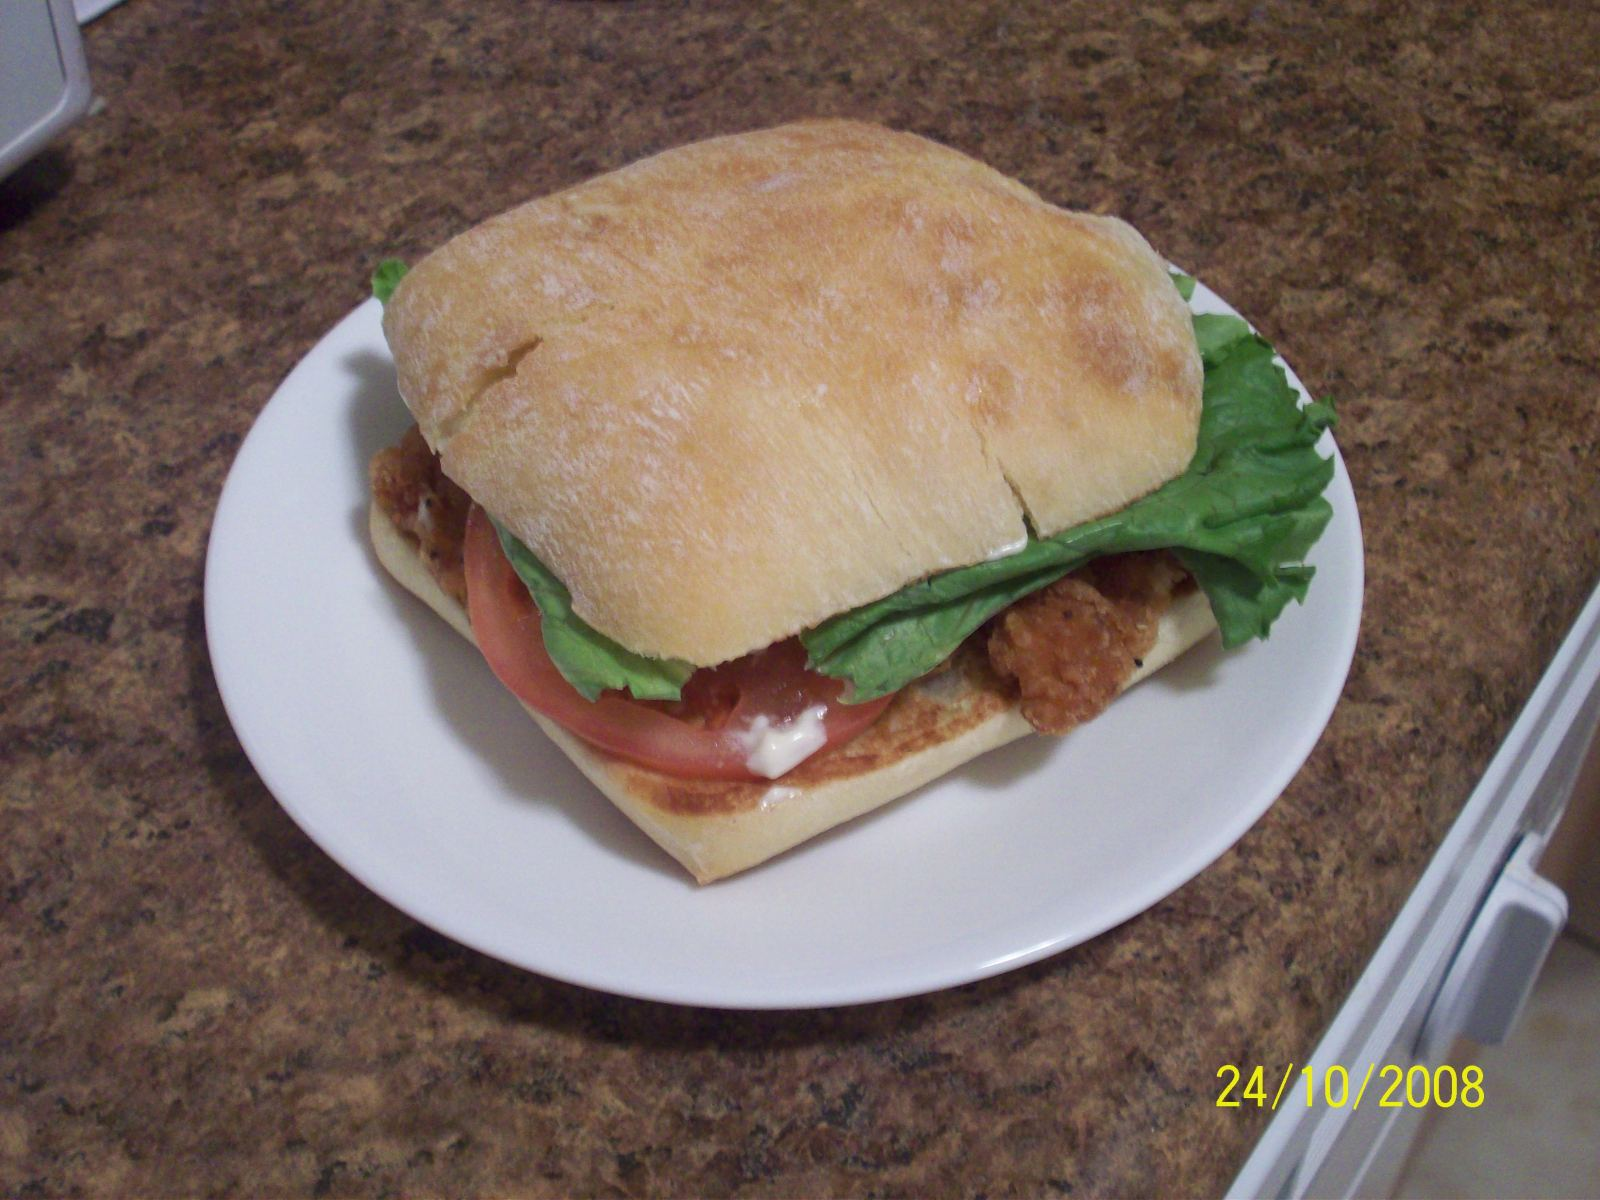 https://foodloader.net/cutie_2008-10-24_chicken_sandwich.jpg